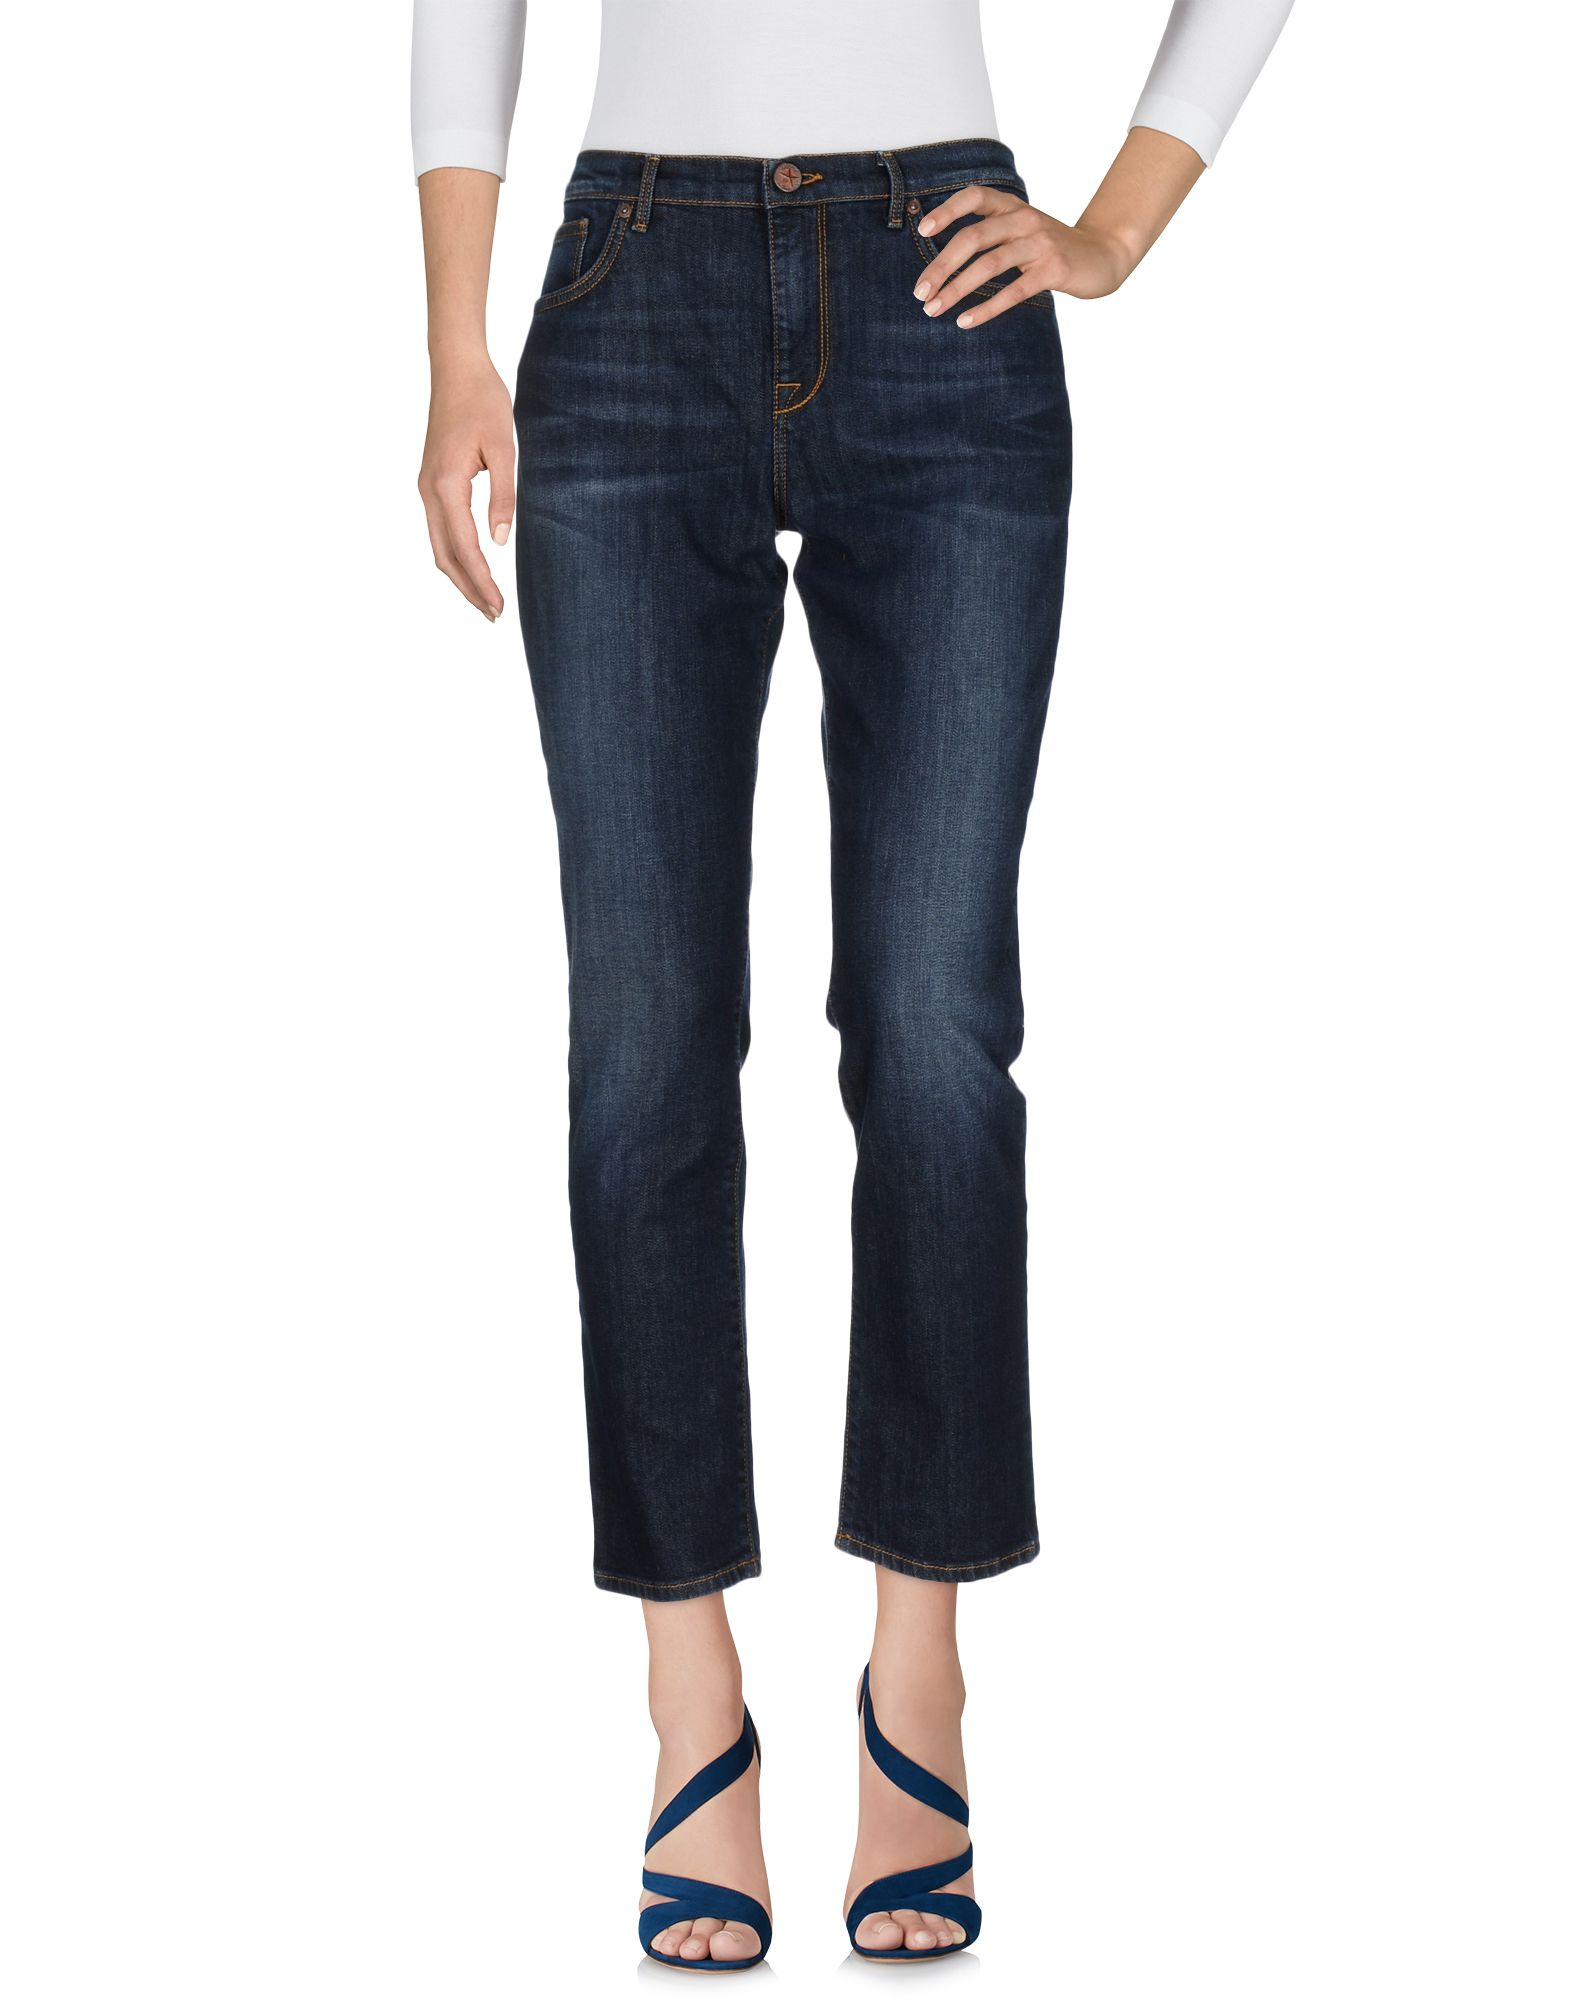 DAVID JOSS Damen Jeanshose Farbe Blau Größe 8 - broschei